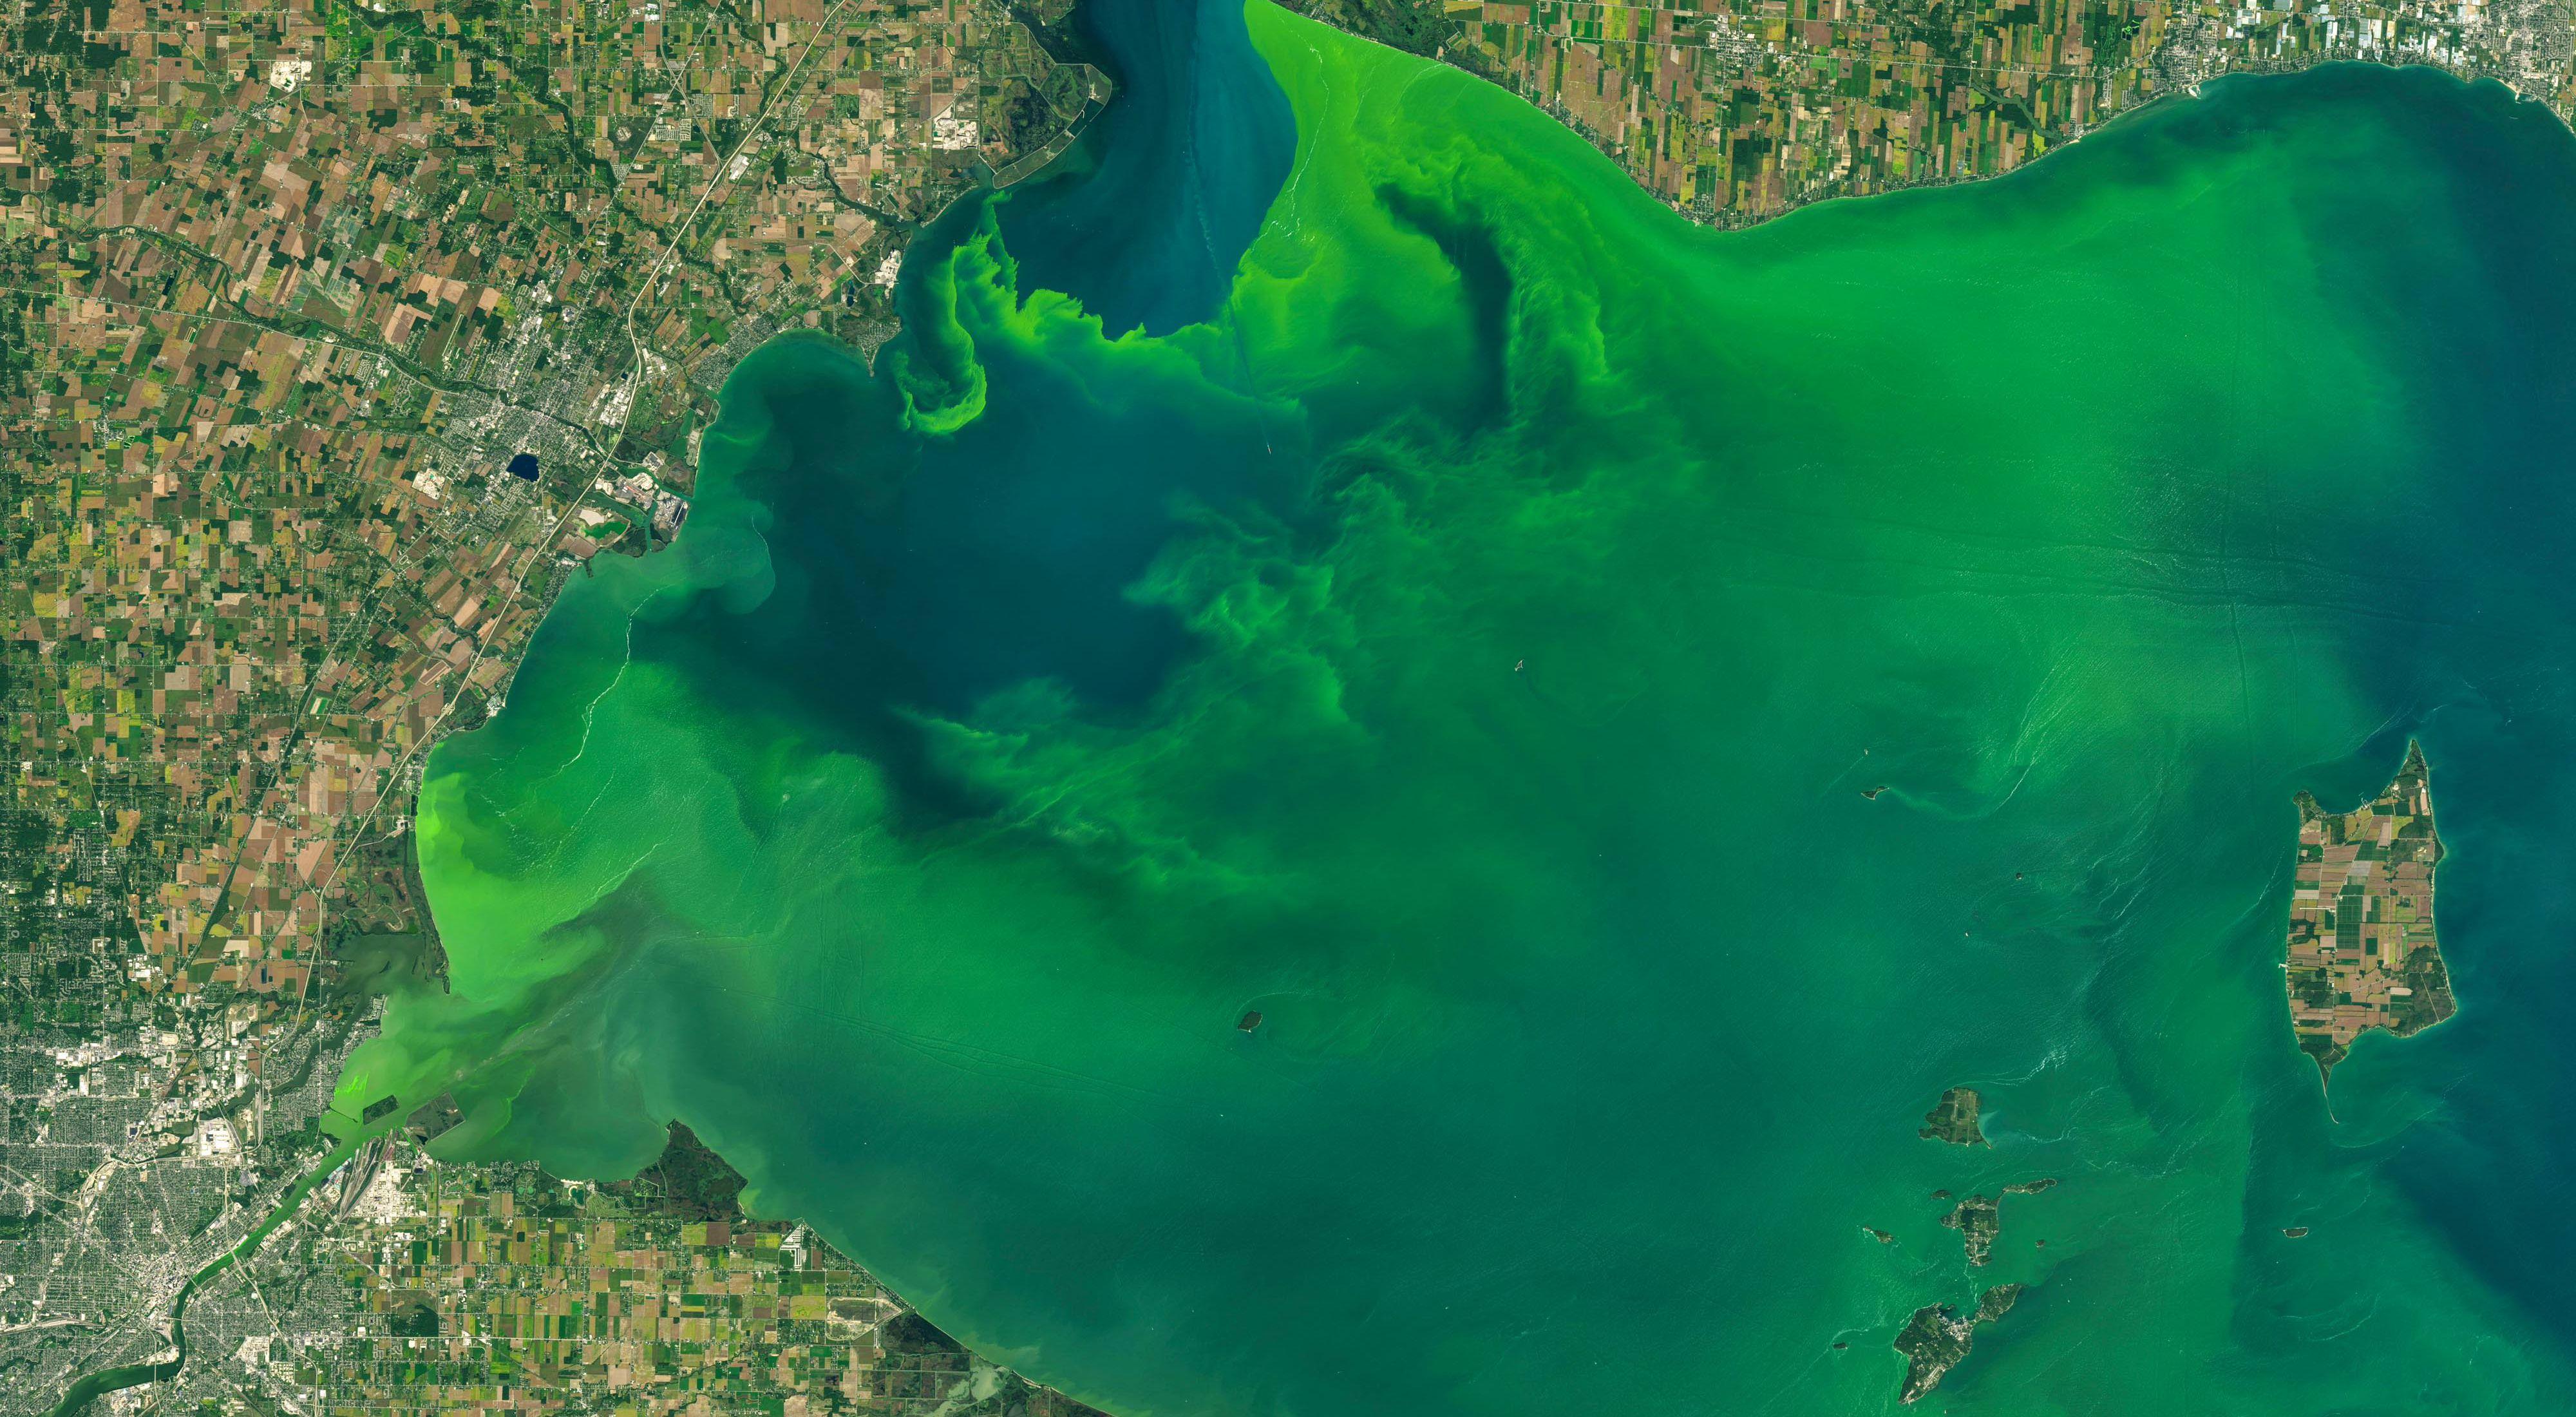 Algal bloom in the western basin of Lake Erie.